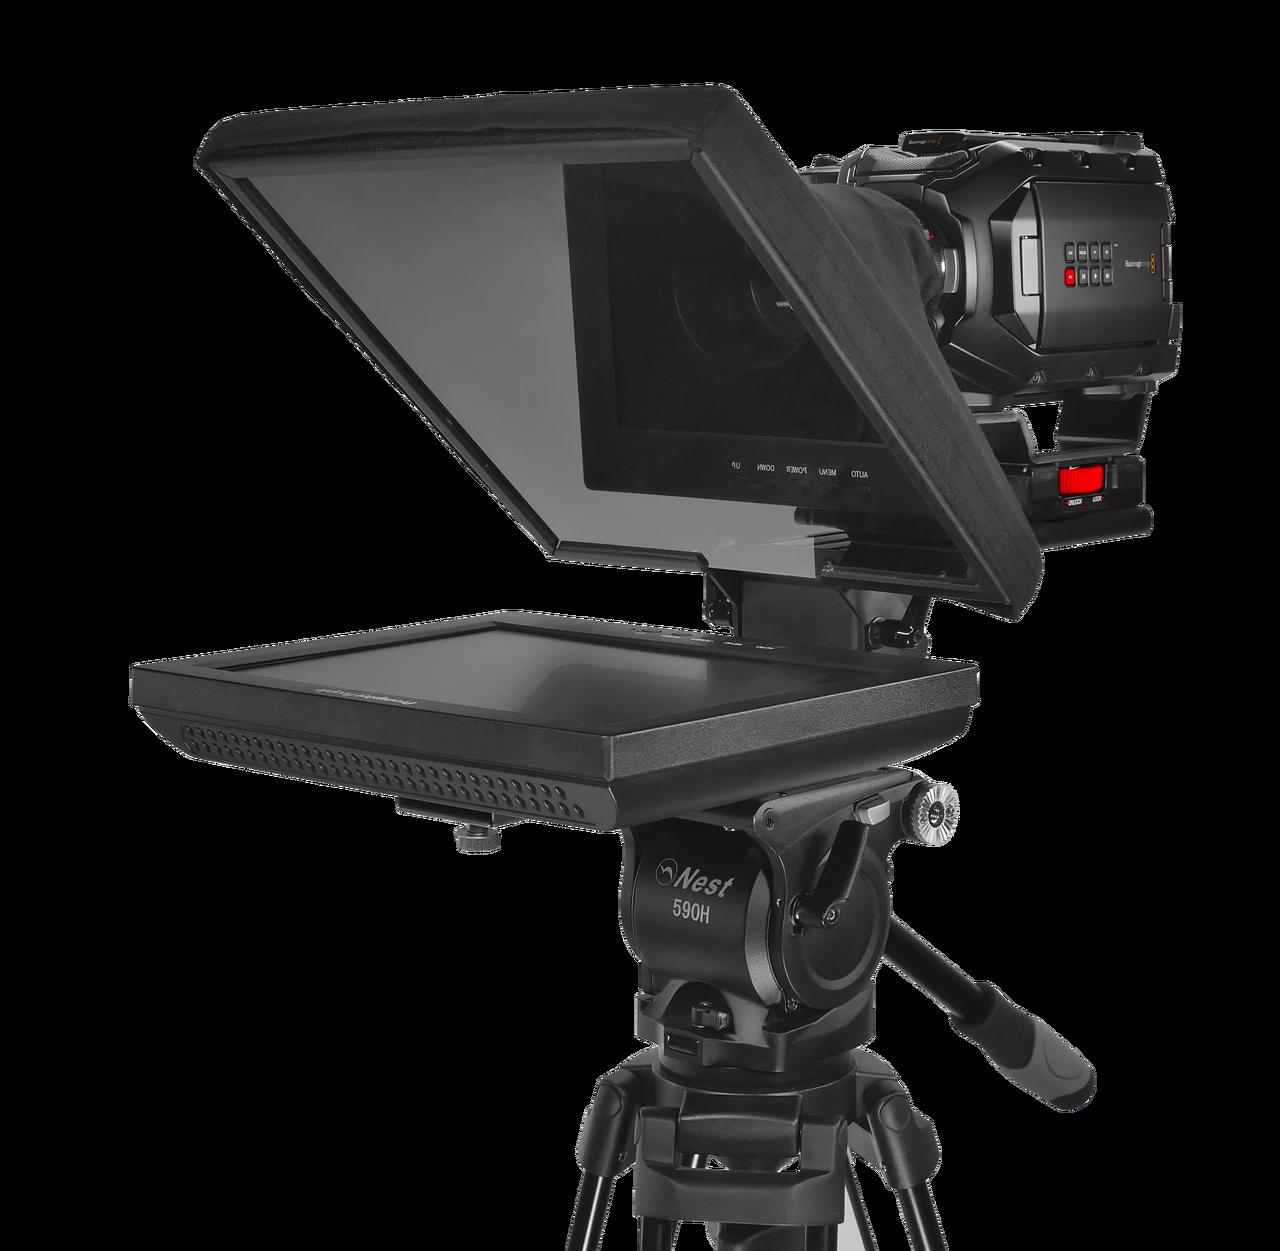 UltraFlex 12 AutoReversing Monitor Model - Angled